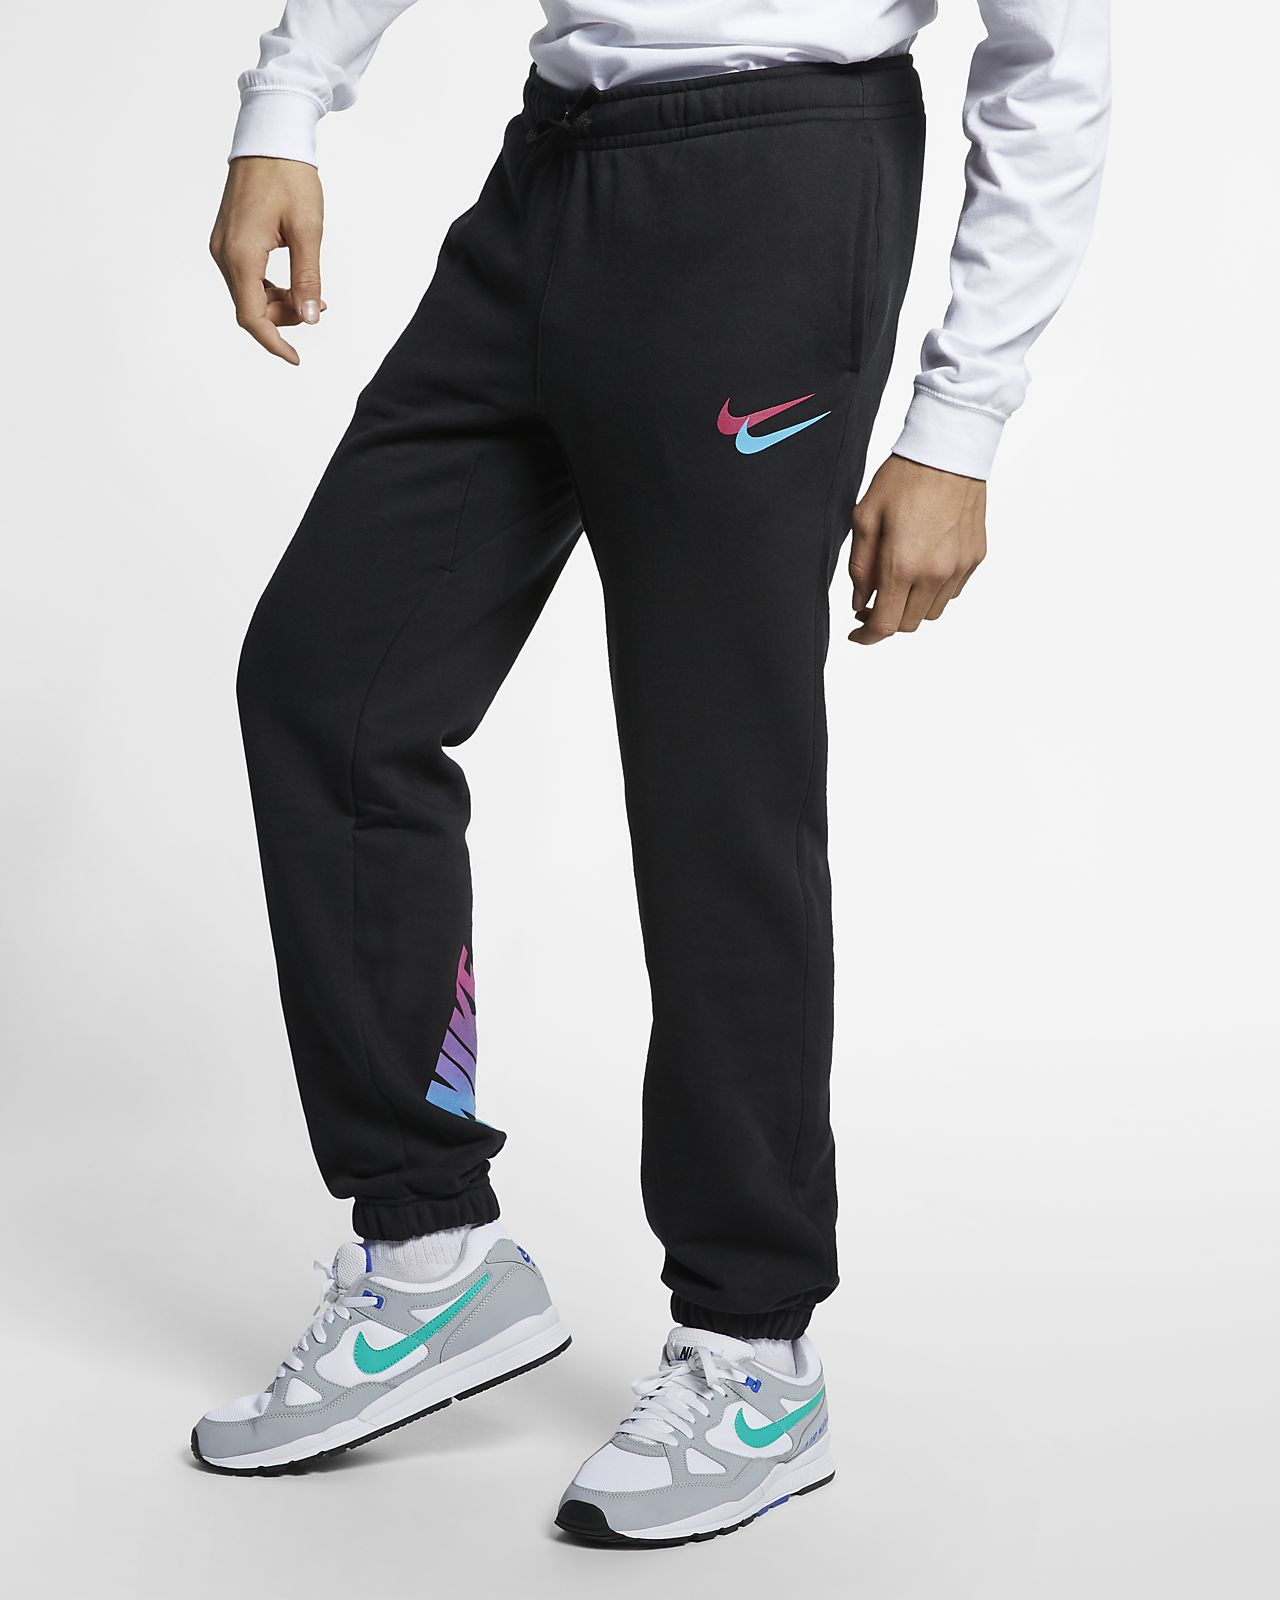 d5e1600da72ccc Nike Sportswear Club Fleece Men s Pants. Nike.com